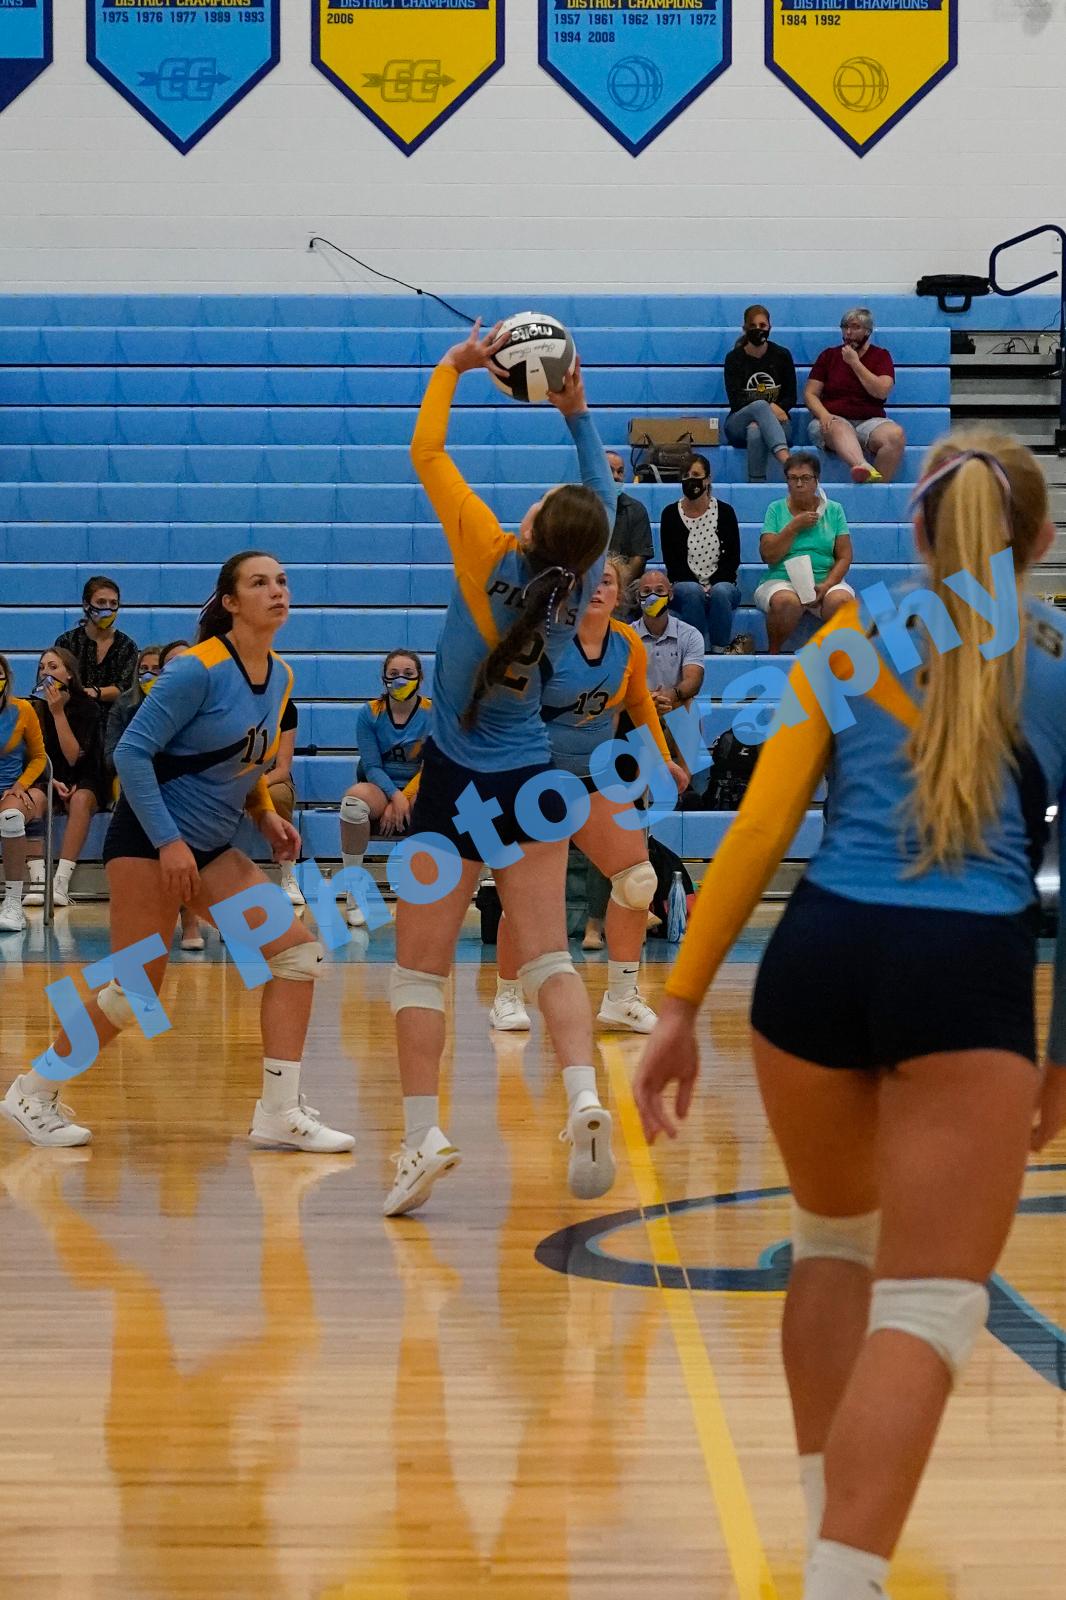 JV Volleyball vs Edgerton 2020